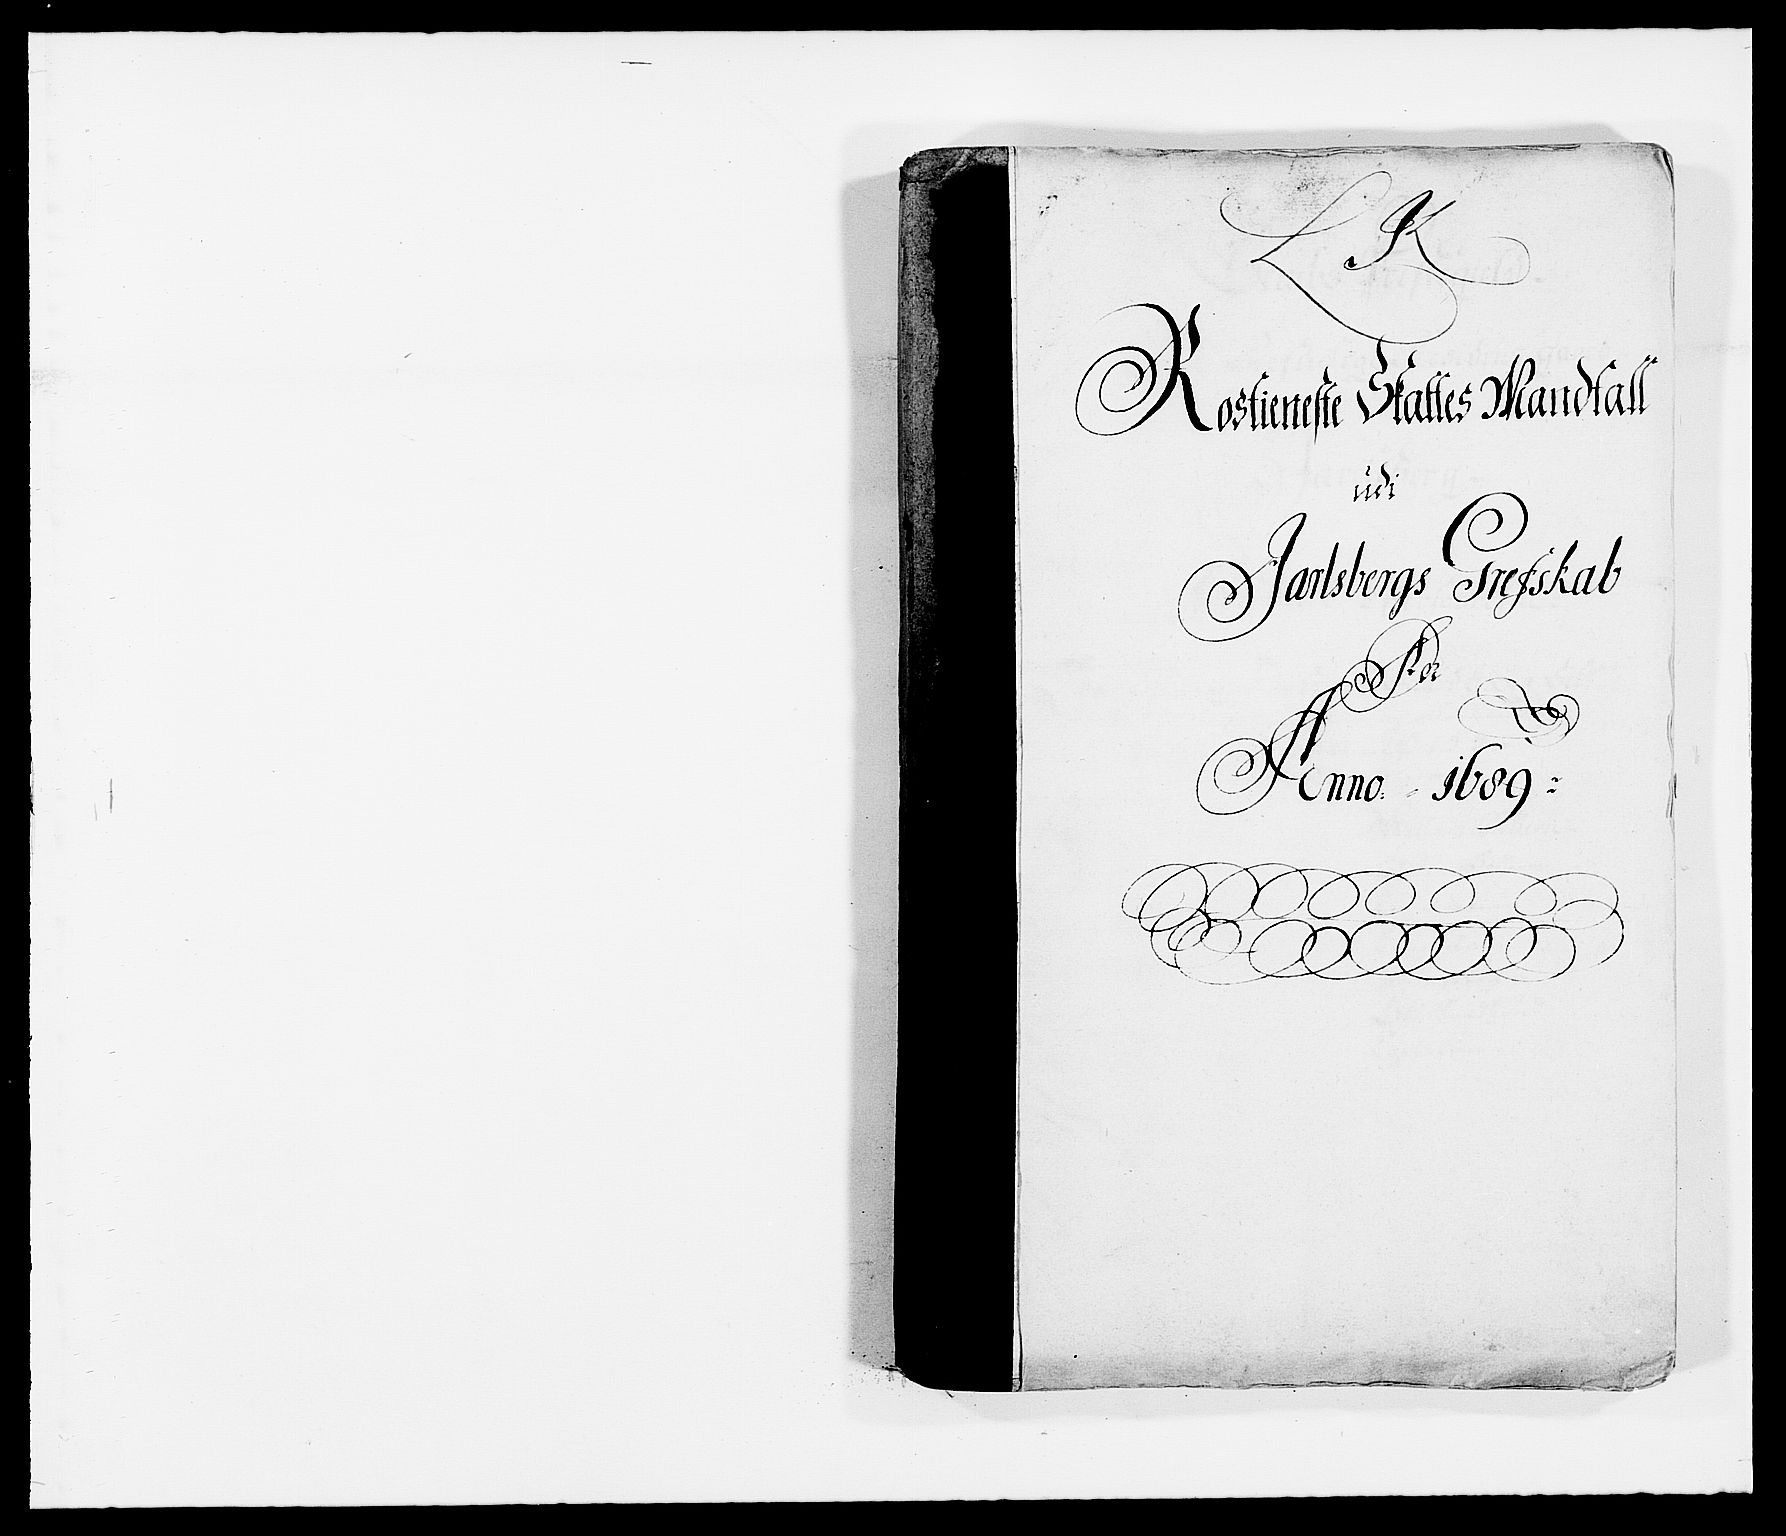 RA, Rentekammeret inntil 1814, Reviderte regnskaper, Fogderegnskap, R32/L1860: Fogderegnskap Jarlsberg grevskap, 1686-1690, s. 371